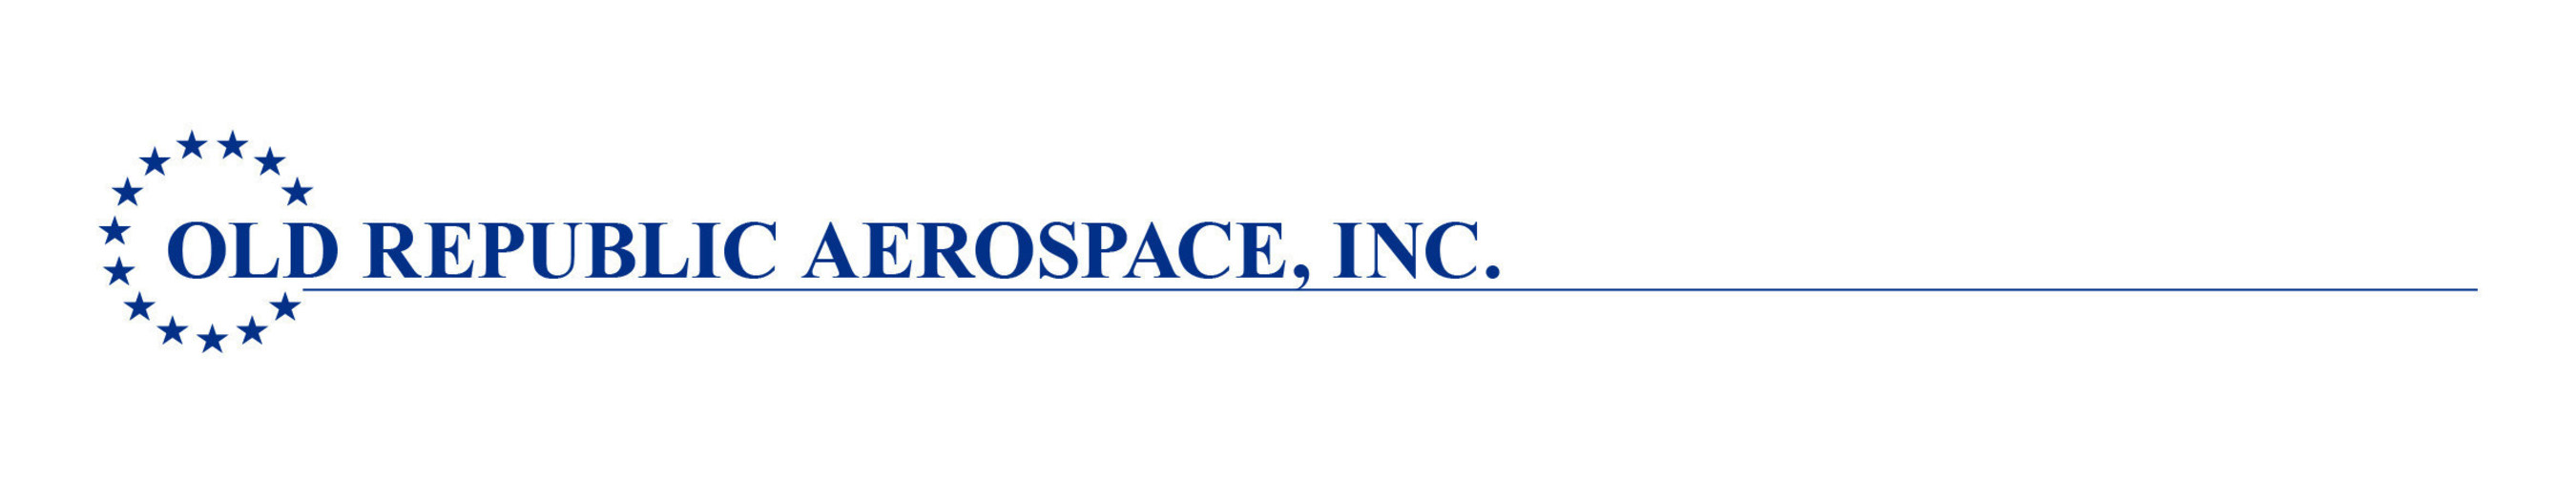 Old Republic Aerospace, Inc. Logo